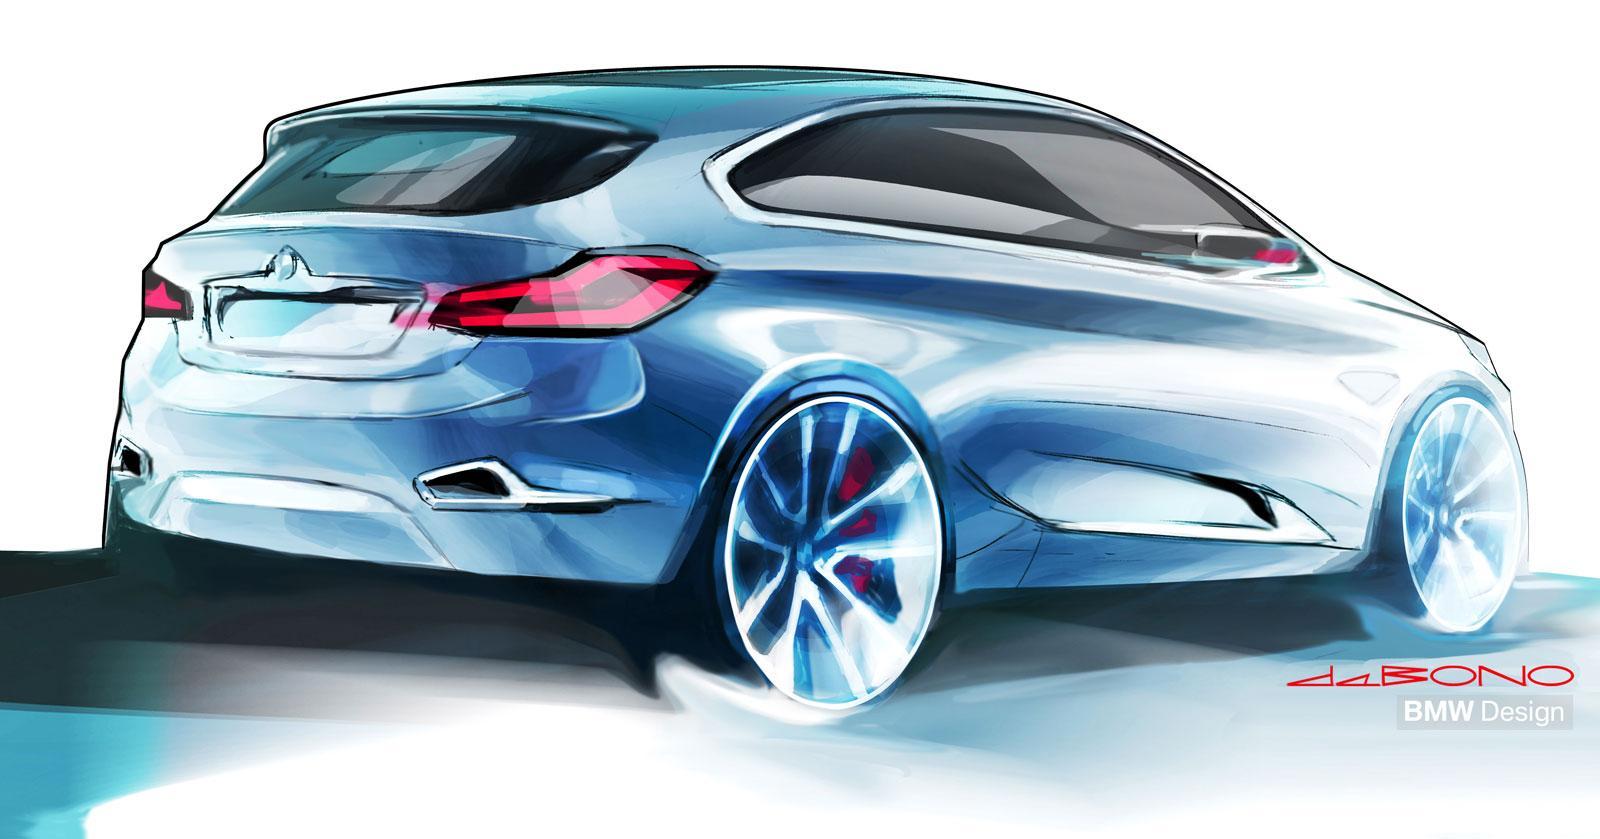 BMW Concept Active Tourer - Design Sketch - Car Body Design